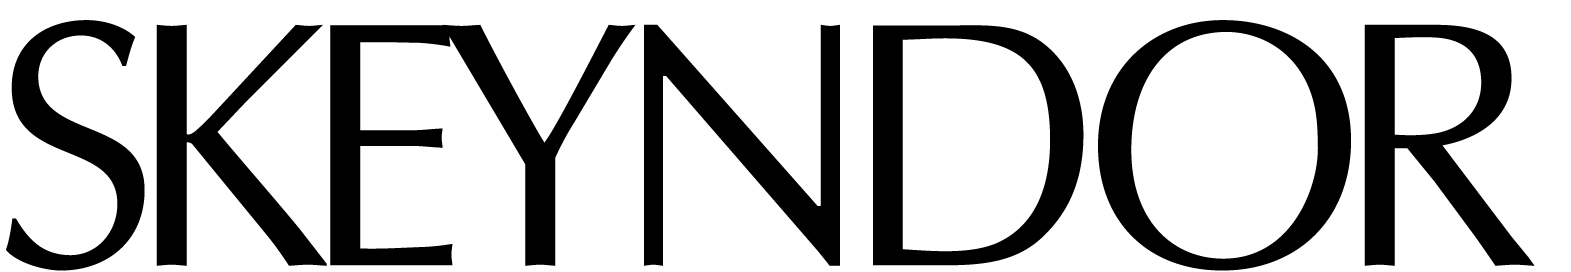 logo-skeyndor-1.jpg